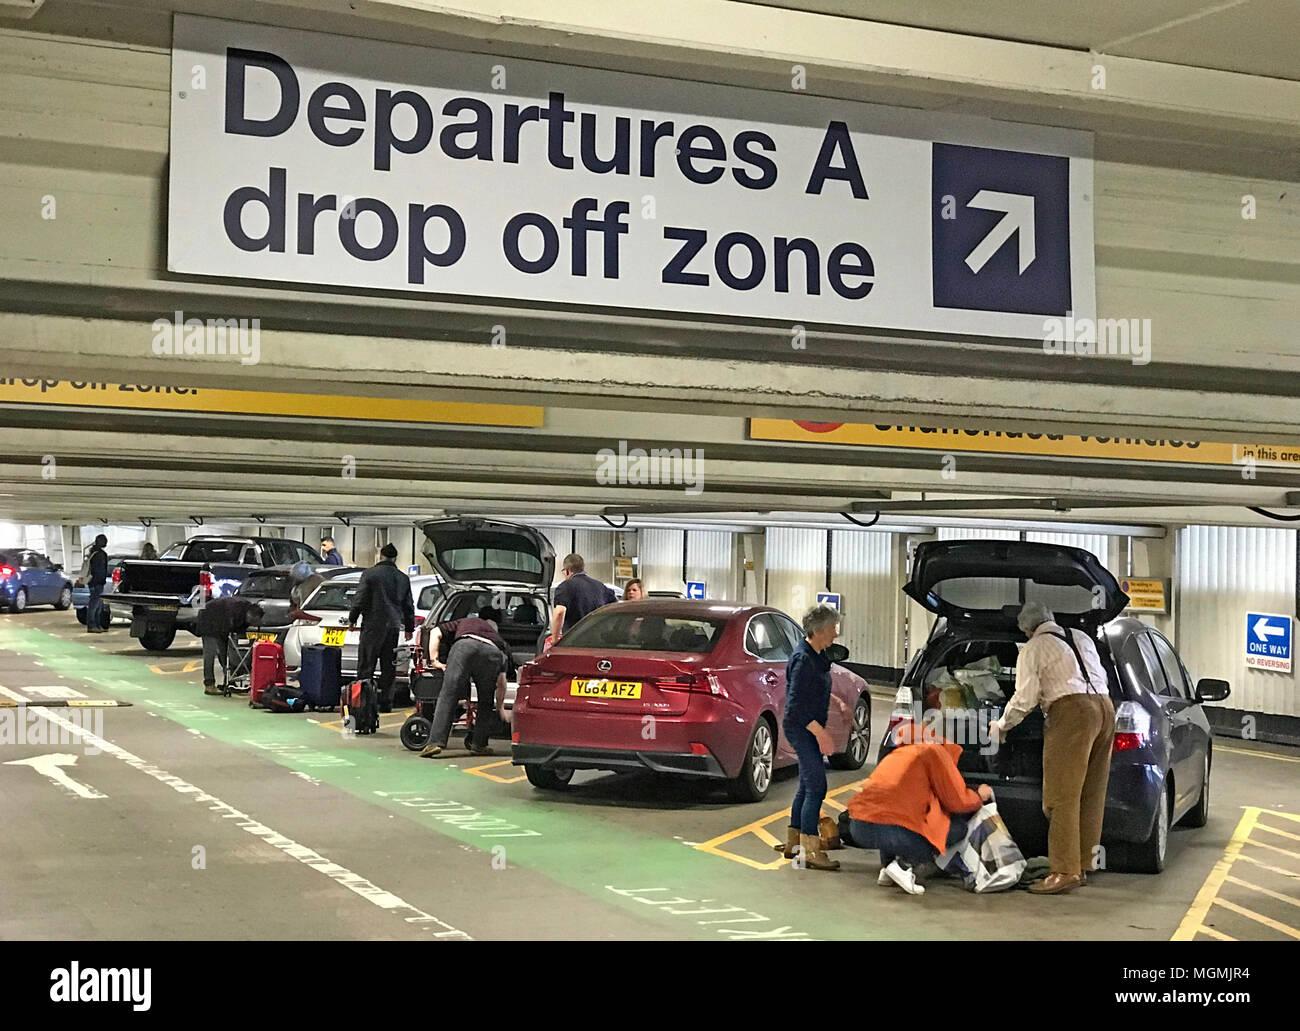 GoTonySmith,free,for,airport,flight,dropoff,drop-off,taxi,friends,tariff,Manchester